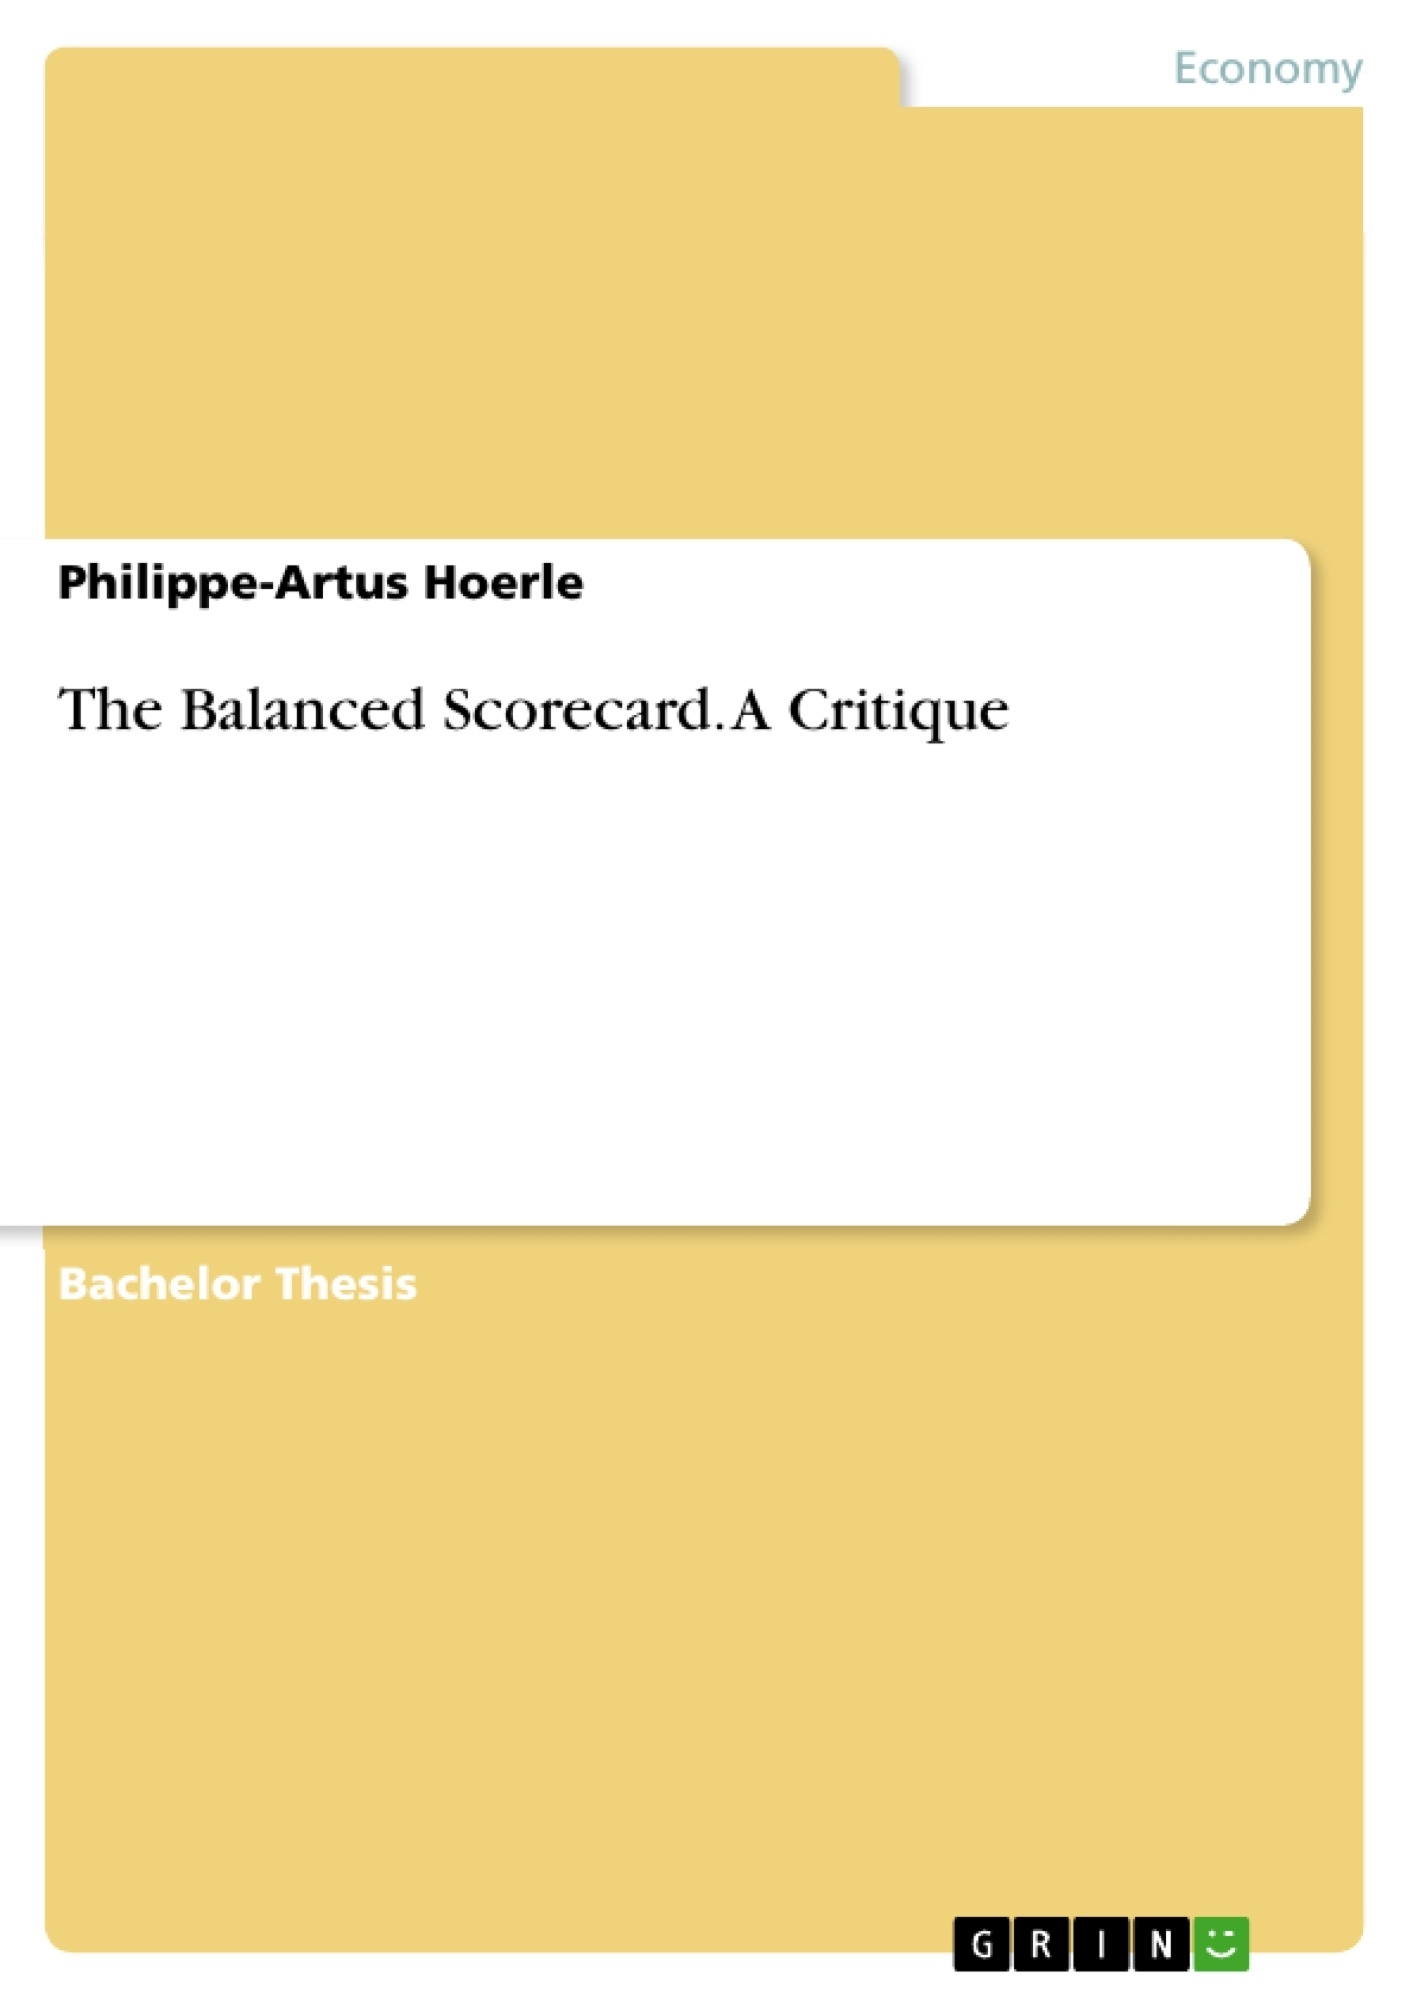 Title: The Balanced Scorecard. A Critique